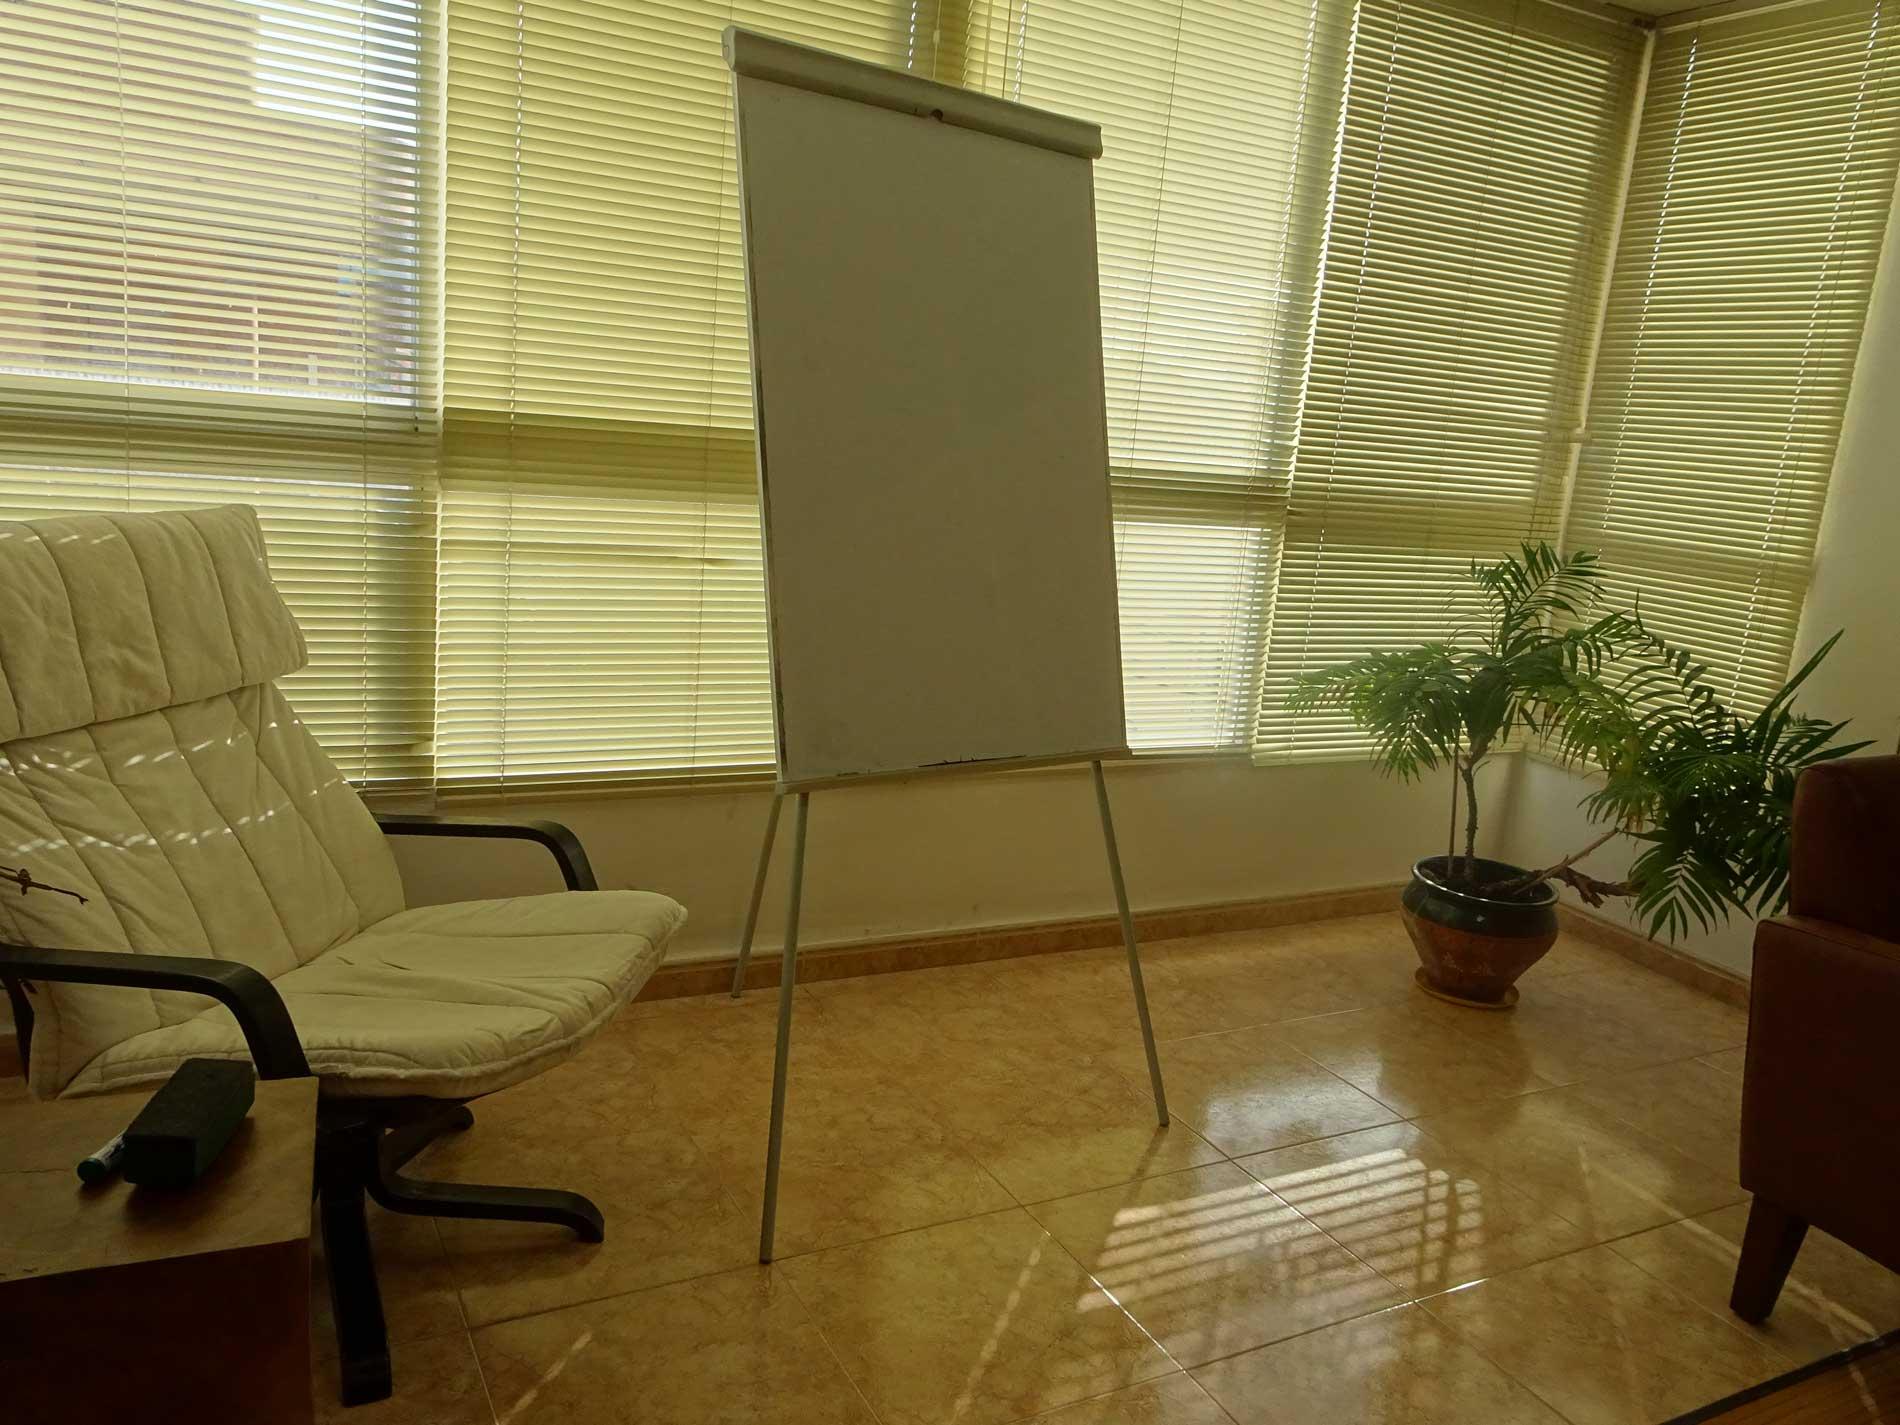 altana-psicólogos-moncada